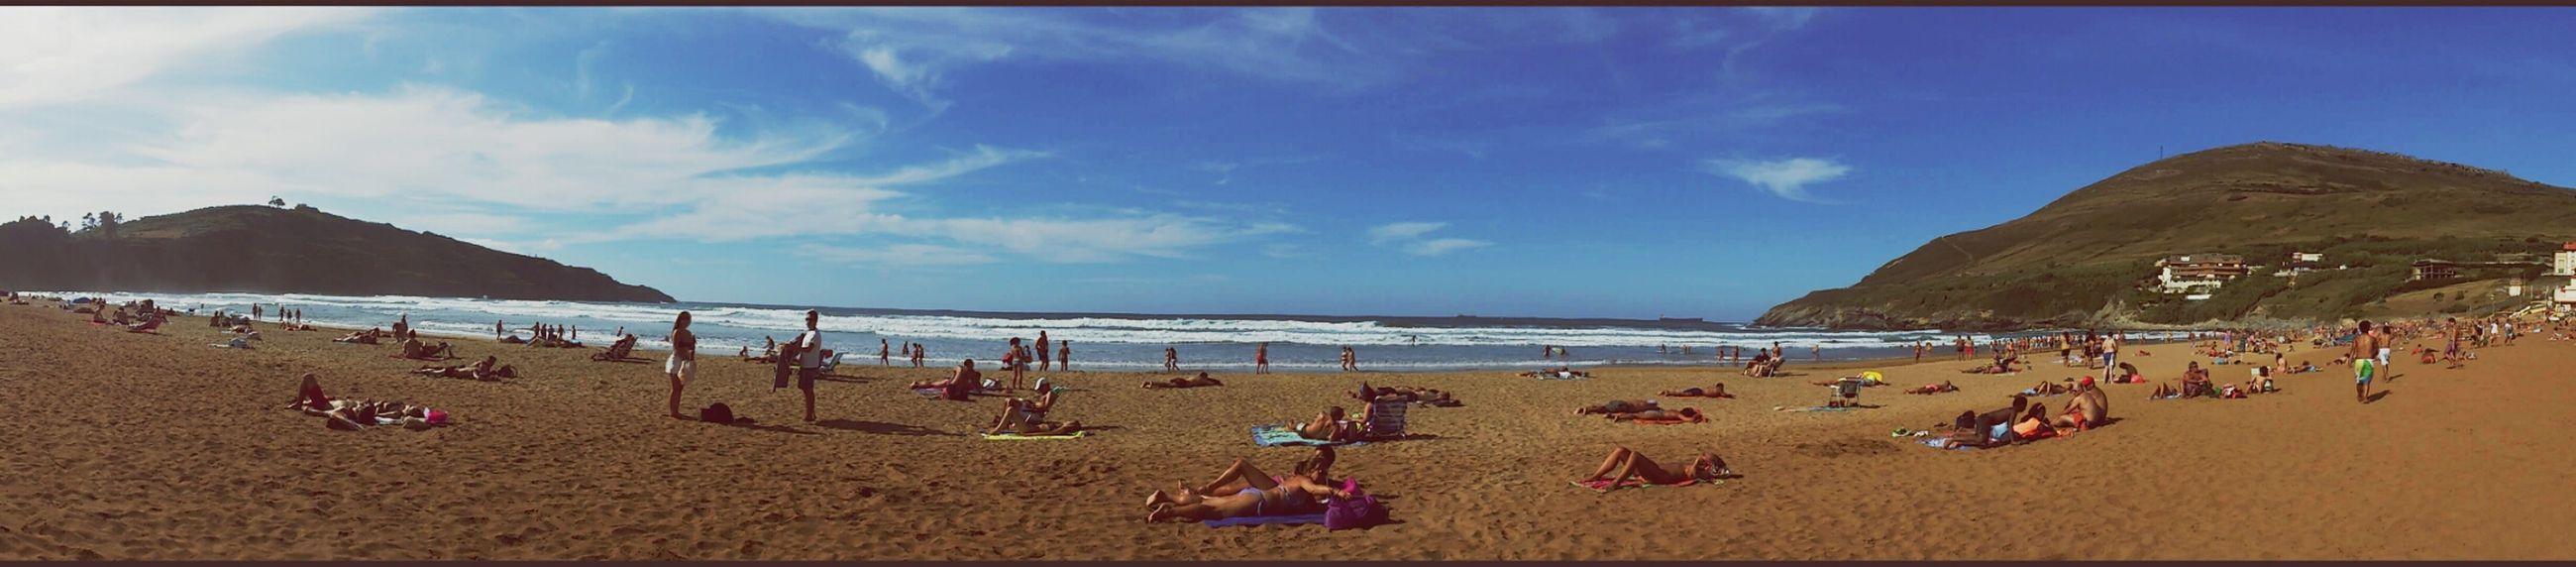 Being A Beach Bum 25 Days Of Summer Getting A Tan Enjoying The Sun fun fun fun...